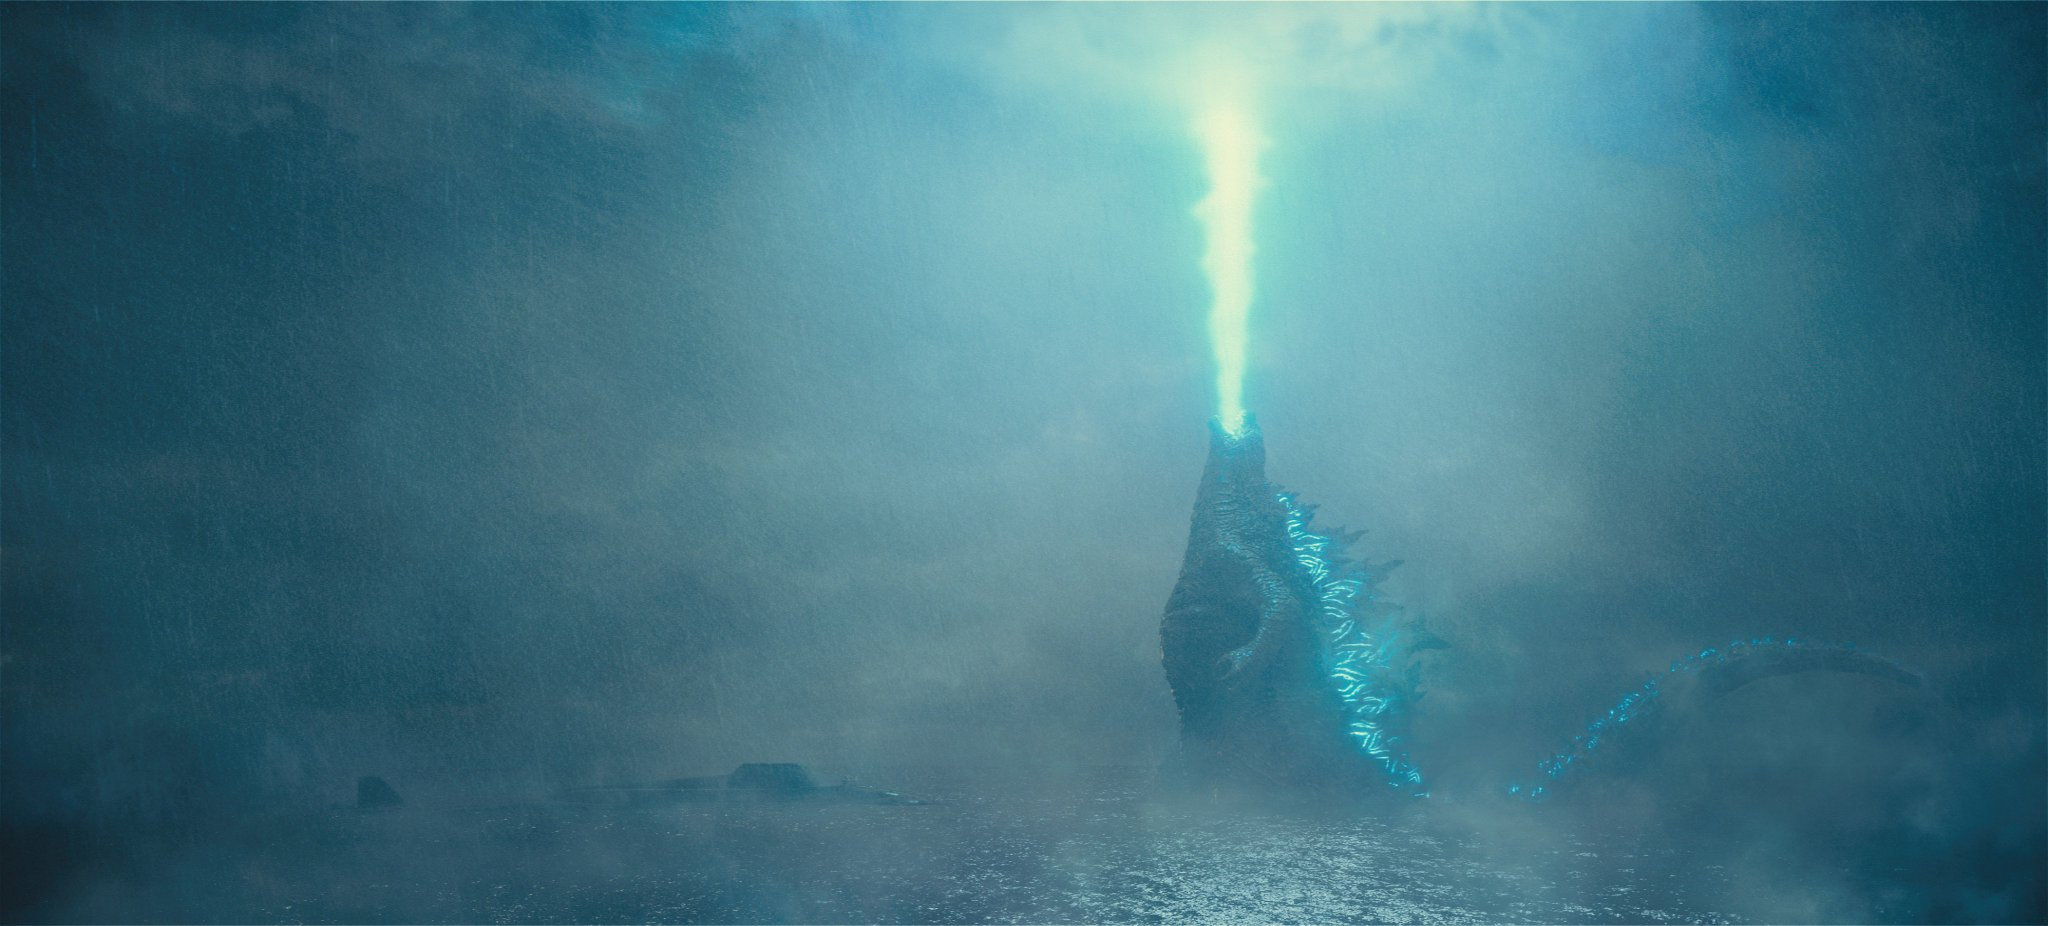 He is risen. https://t.co/yFsrtqmsP2 @GodzillaMovie https://t.co/2uSJva0nsB